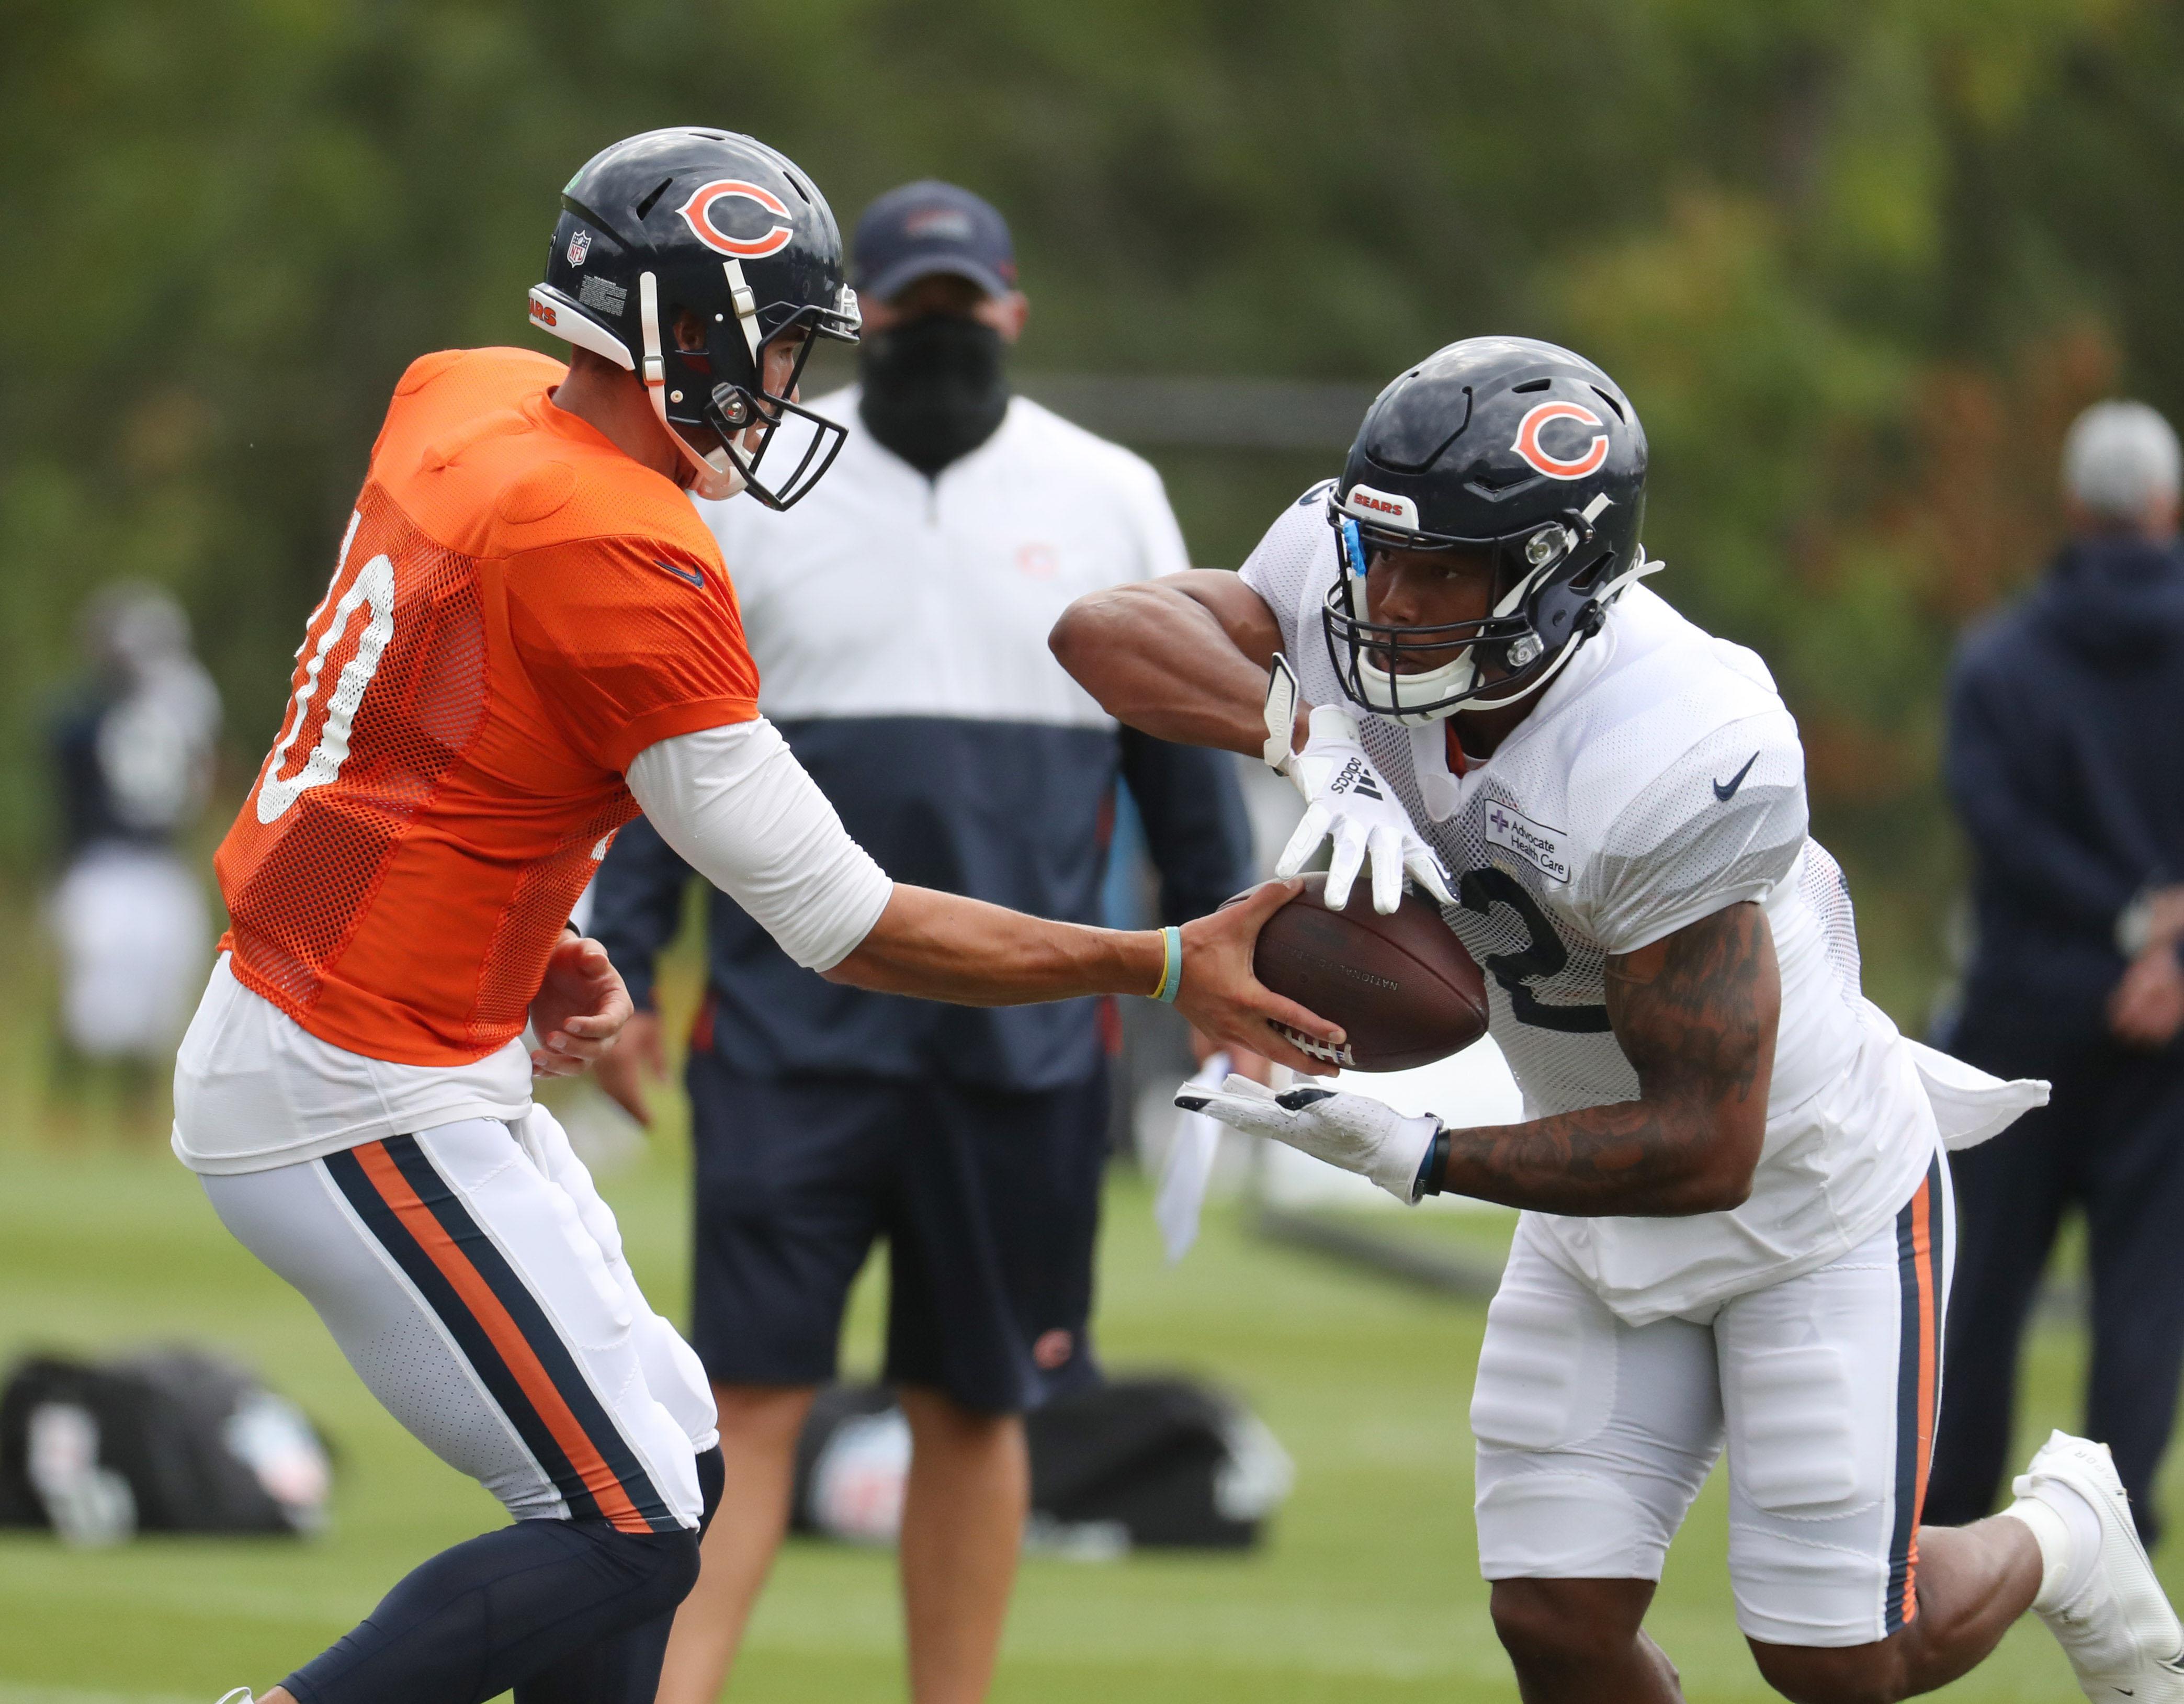 NFL: Chicago Bears Training Camp